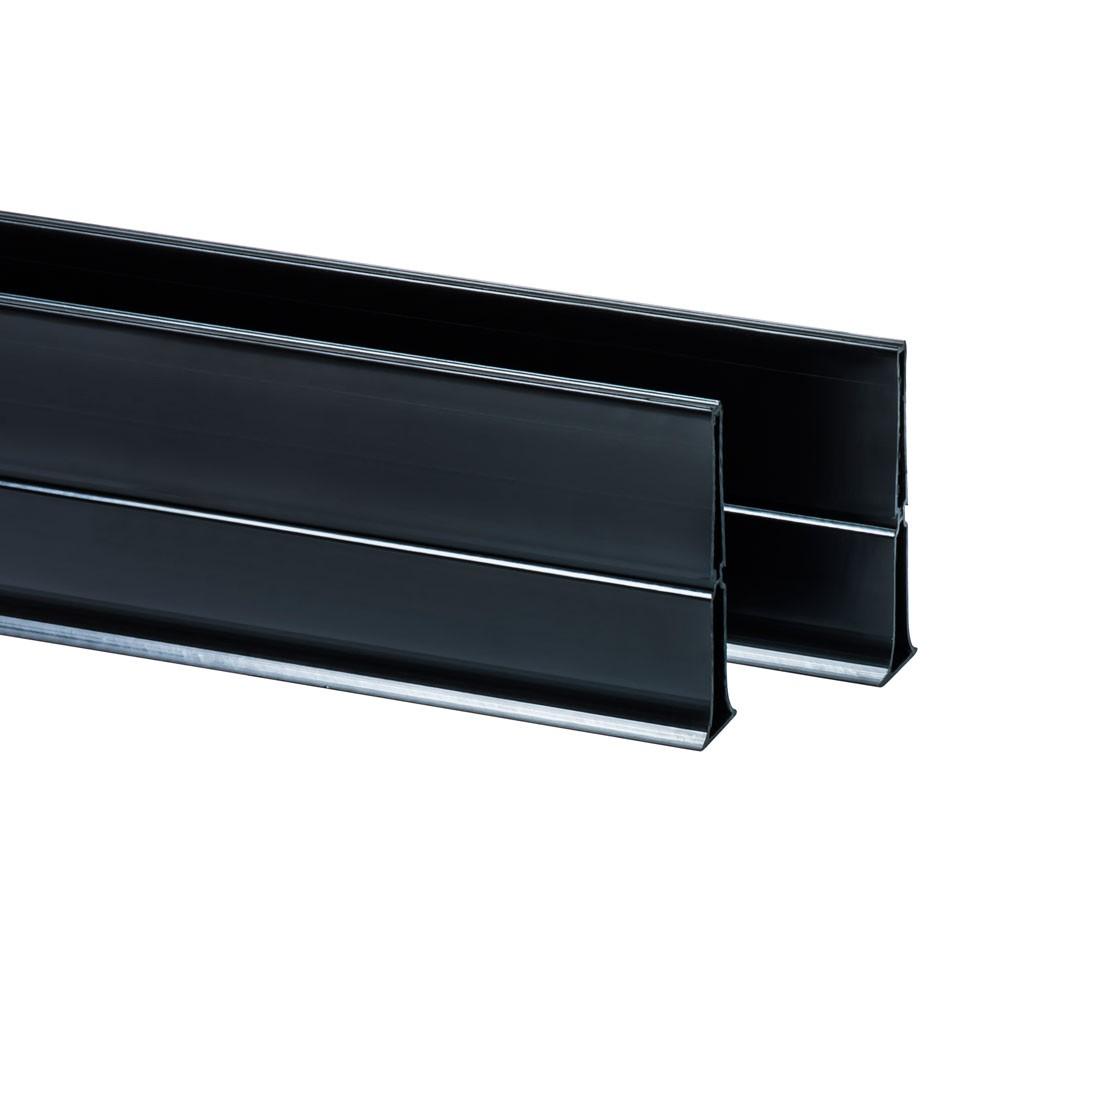 craftsman chest slides storage tool organizers drawers red wrench box organizer drawer portable toolbox